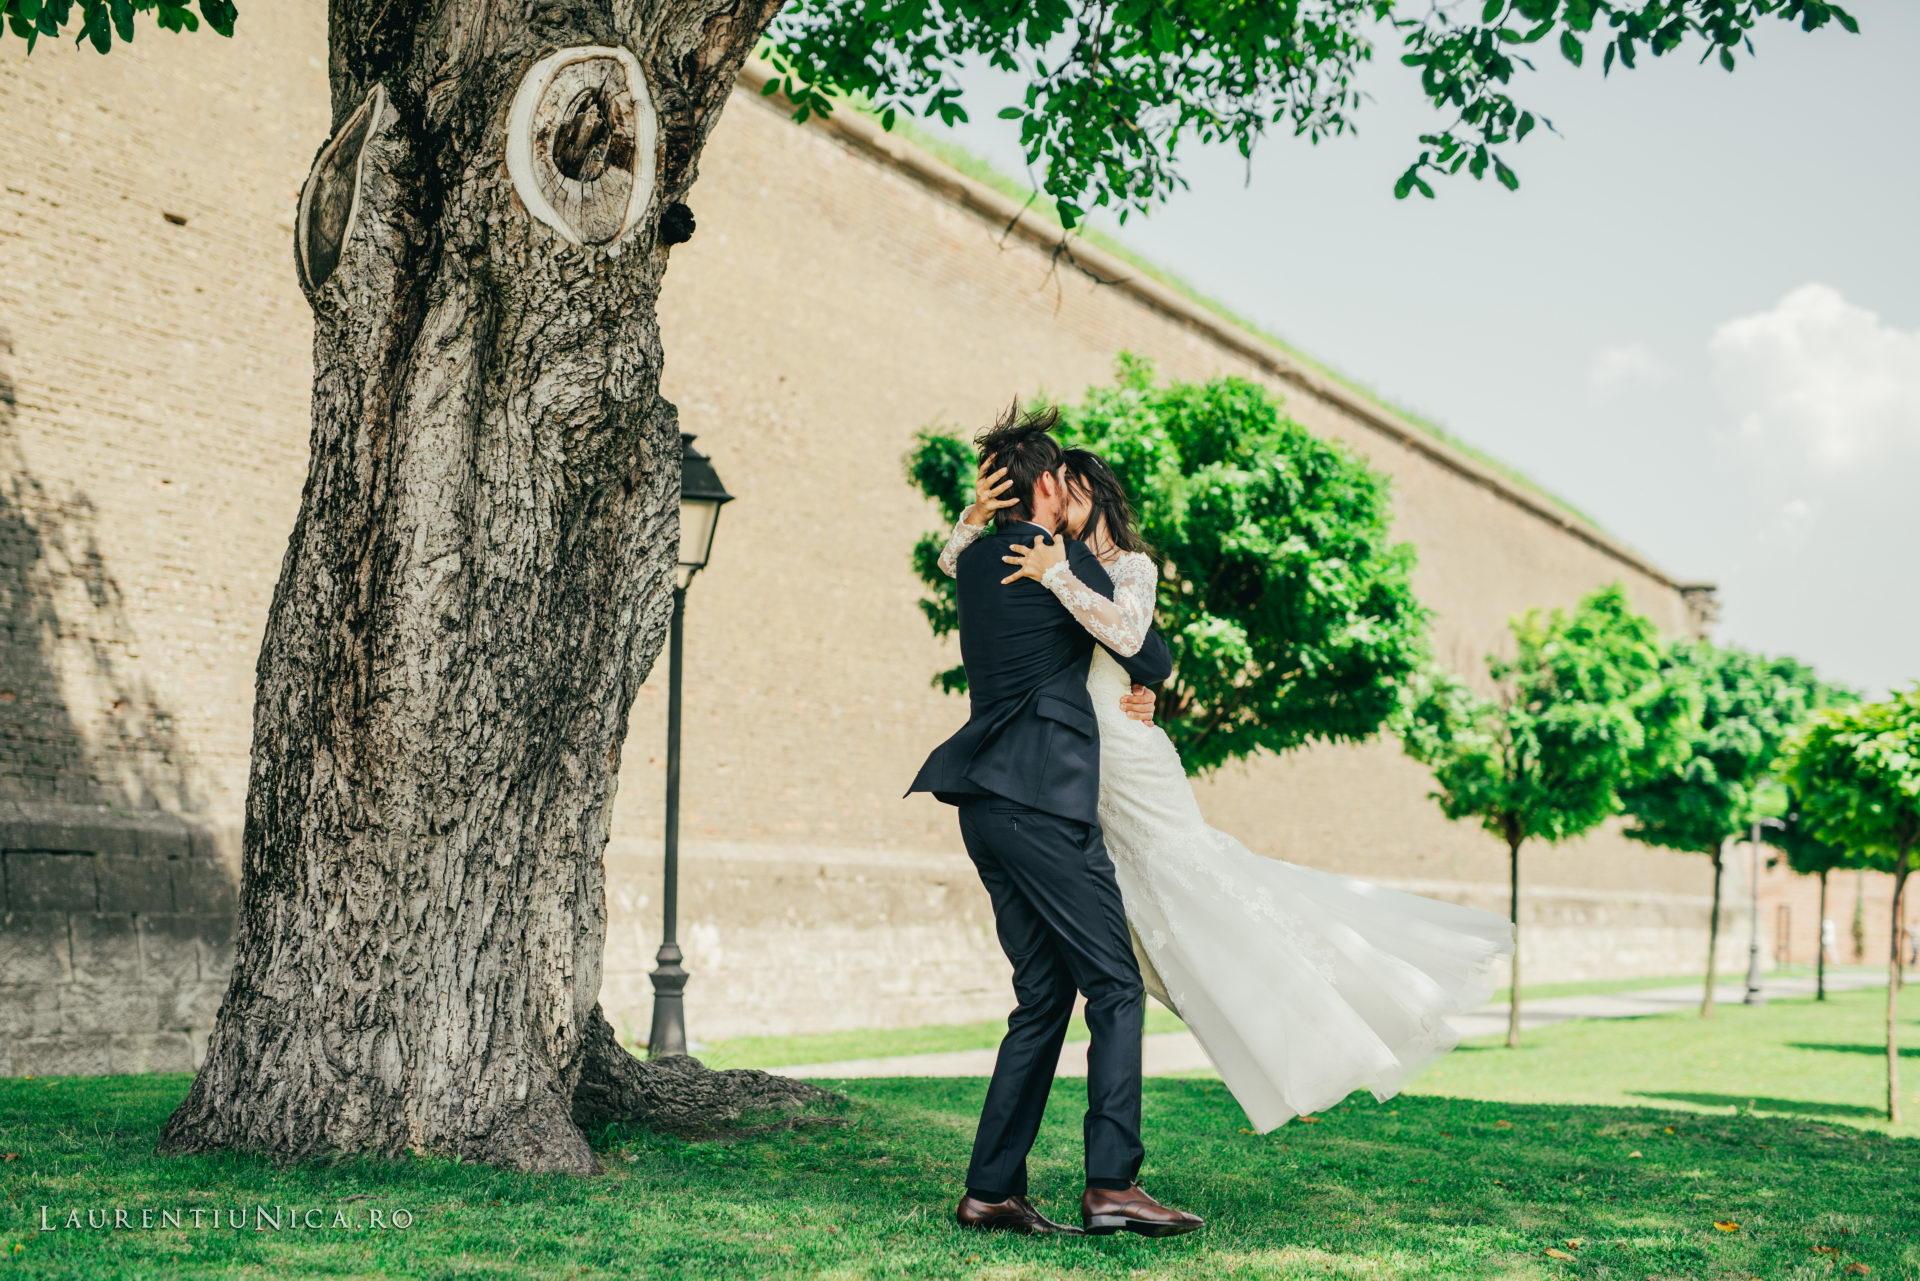 cristina_si_ovidiu-after-wedding-alba-iulia_fotograf_laurentiu_nica_40